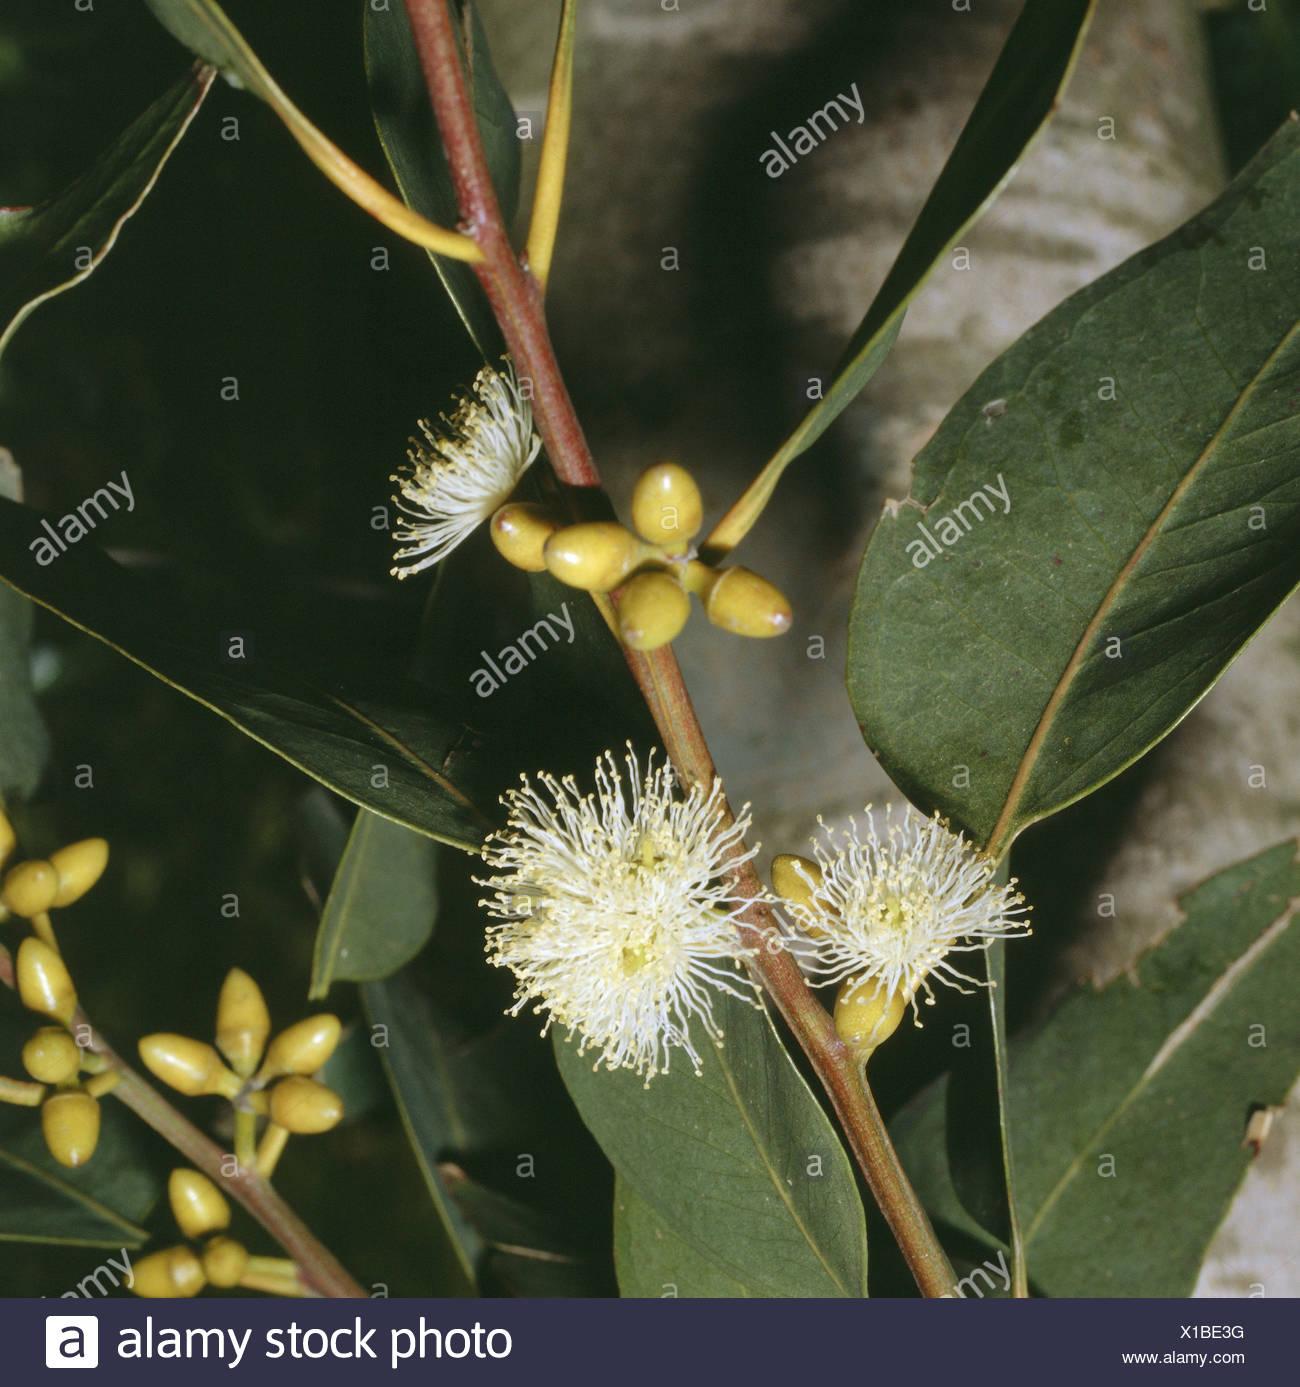 Eucalyptus eucalyptus globulus labill leaves buds blossoms close nature botany flora fever gum tree eucalyptus globulus plant blossom leaves fig kind shrub blossom white blossoming flower flowers leaves mightylinksfo